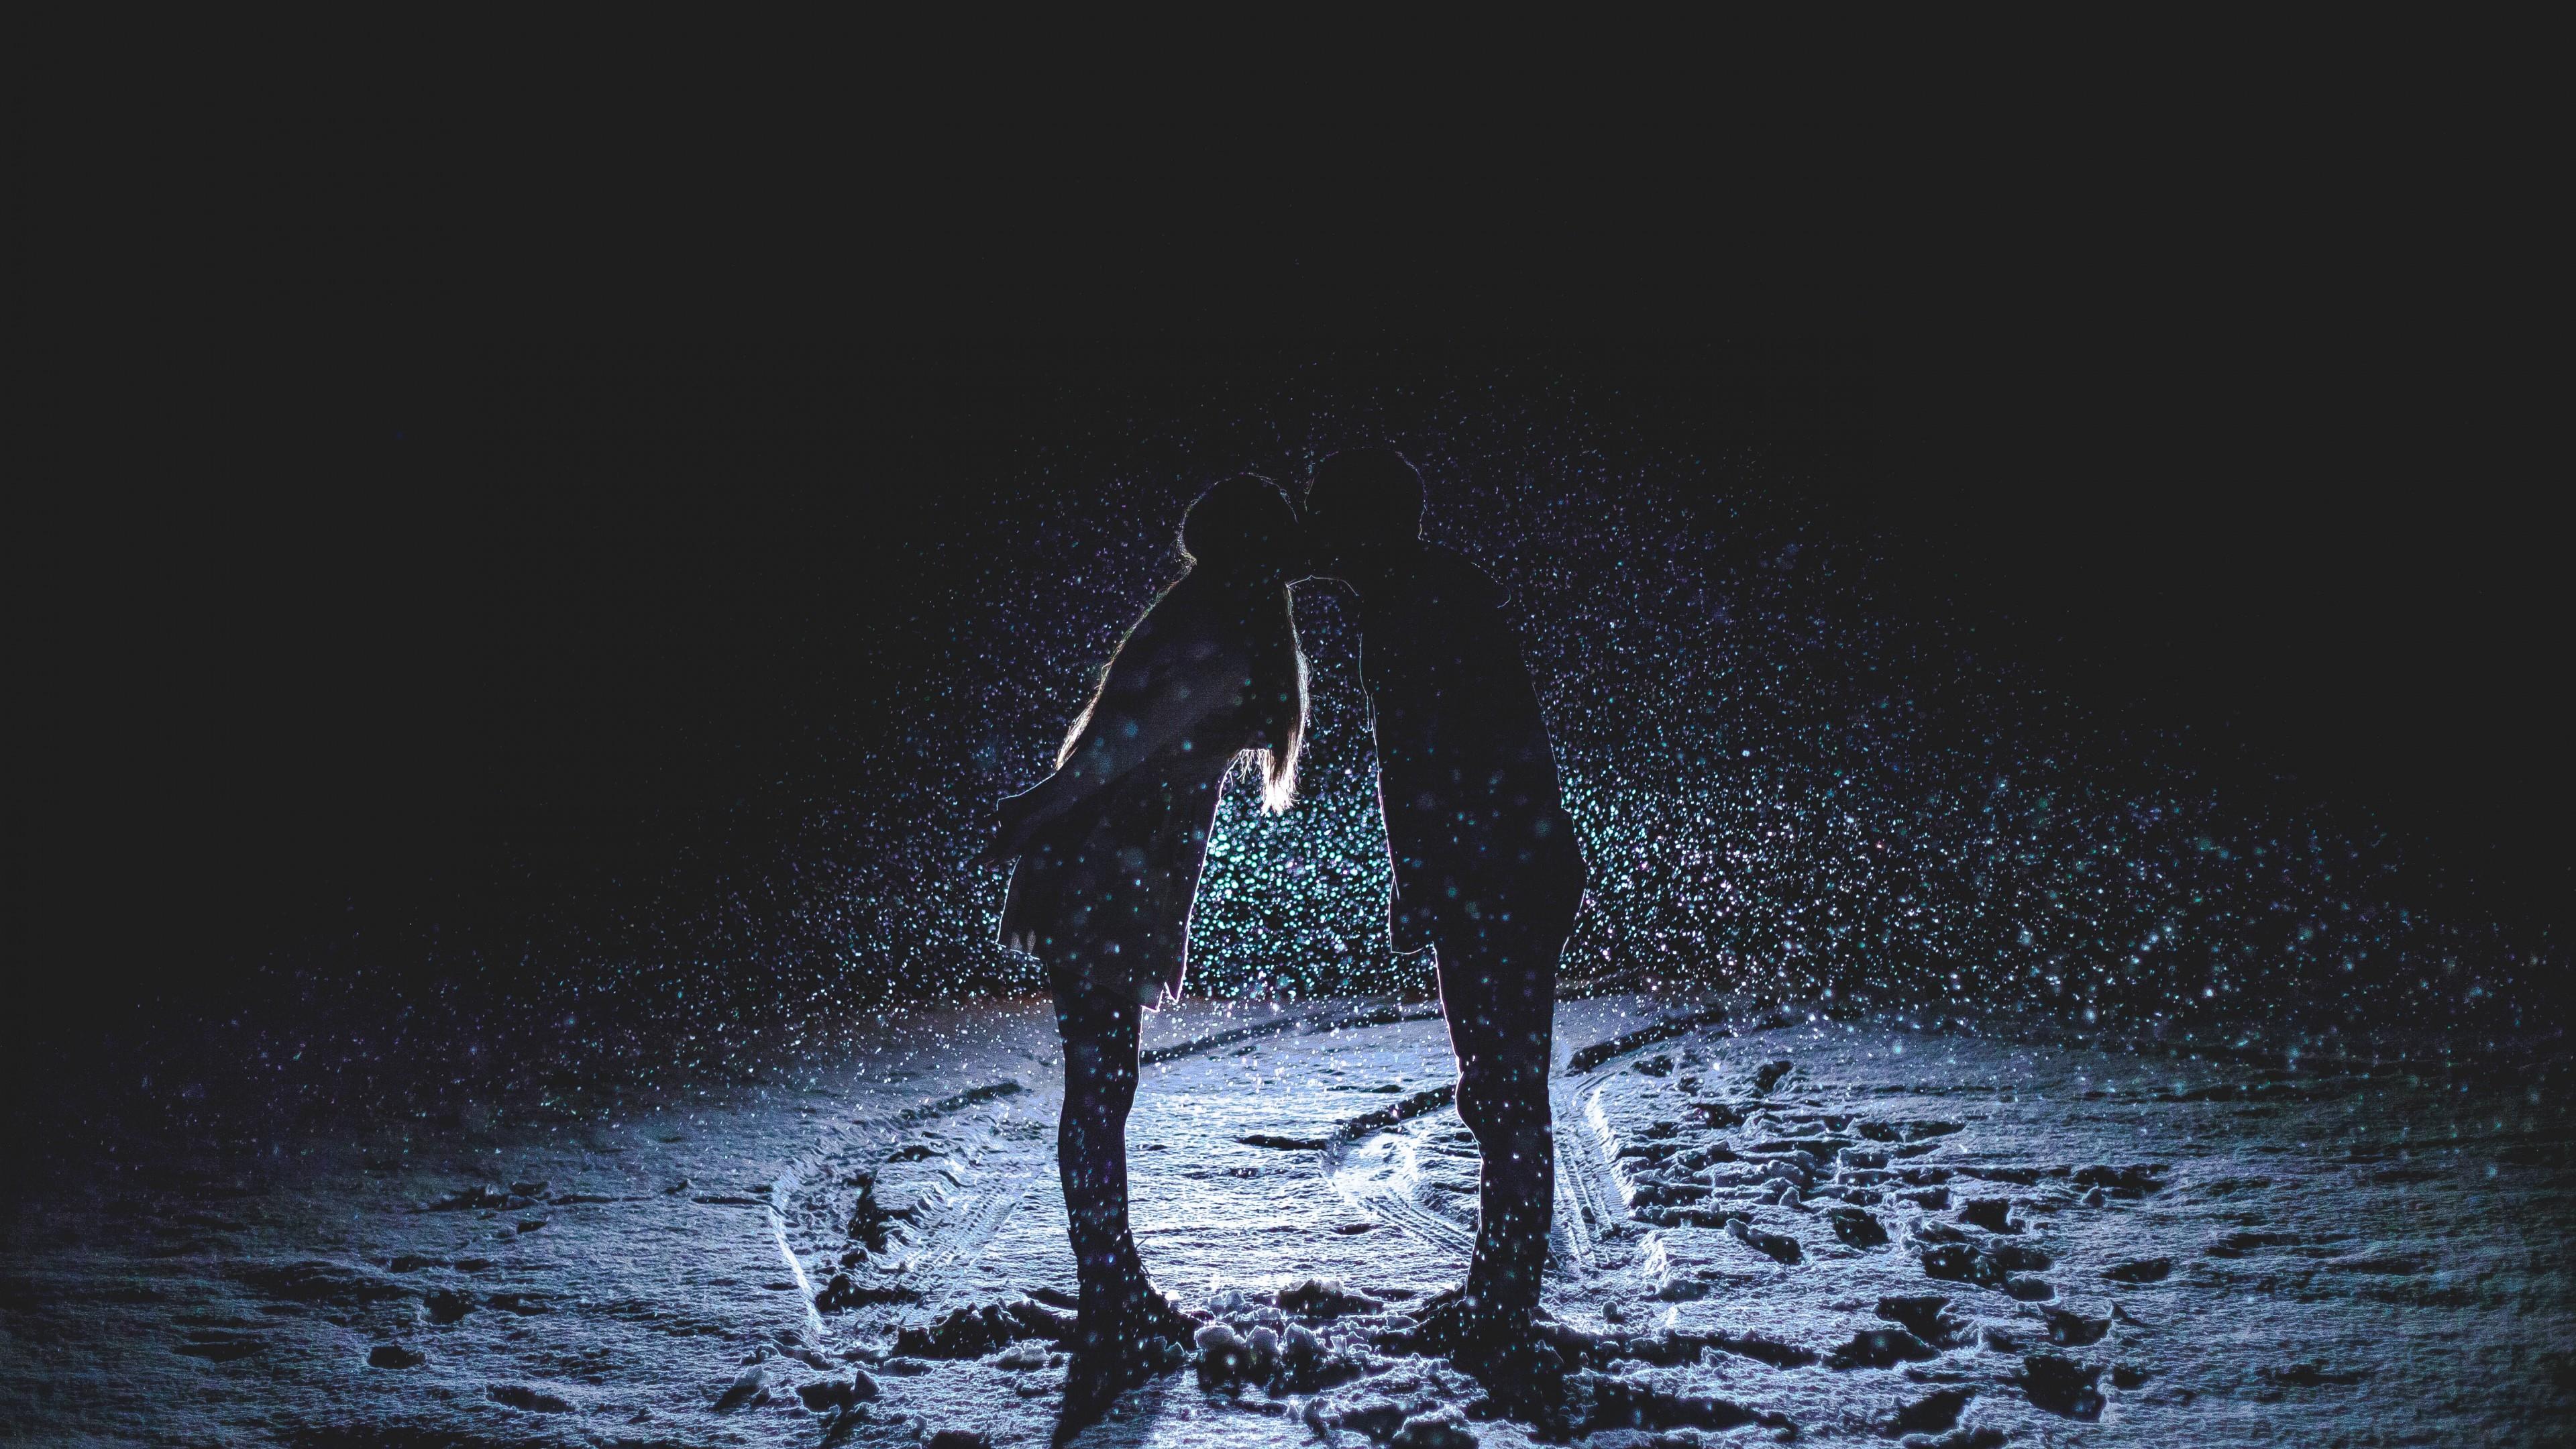 Romantic Love Couple Kissing Hd Wallpaper For Desktop And Mobiles 4k